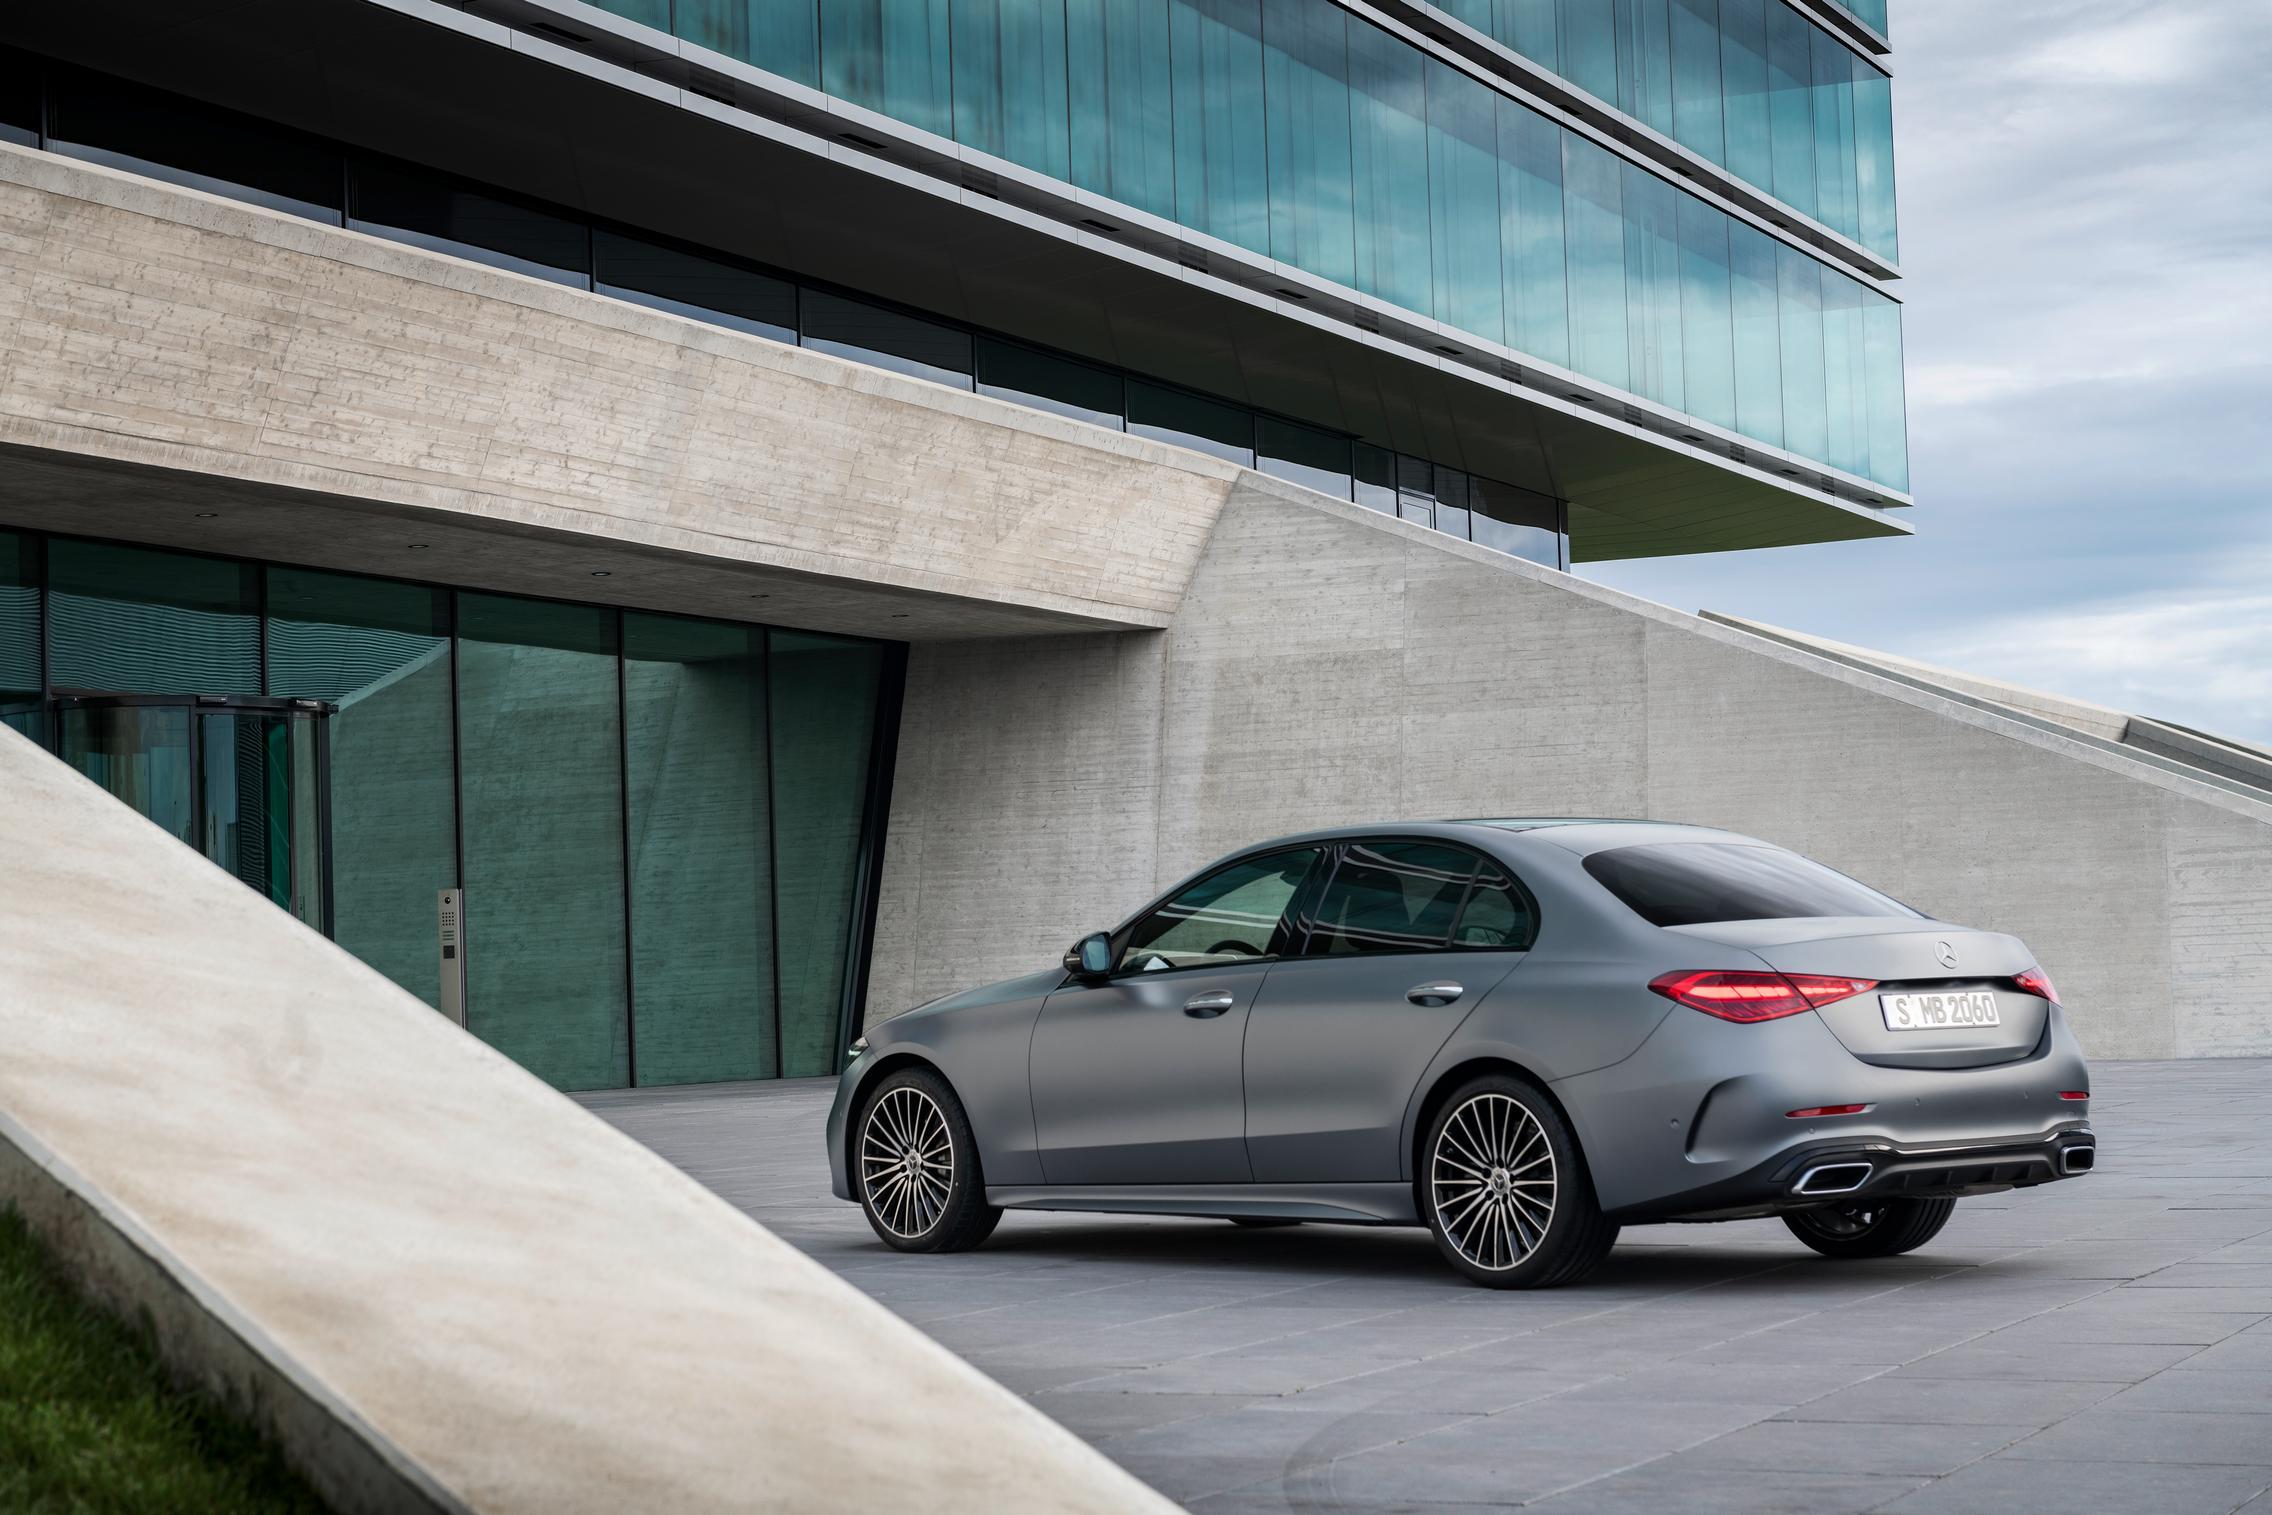 New-W206-C-Class-rear-side-view